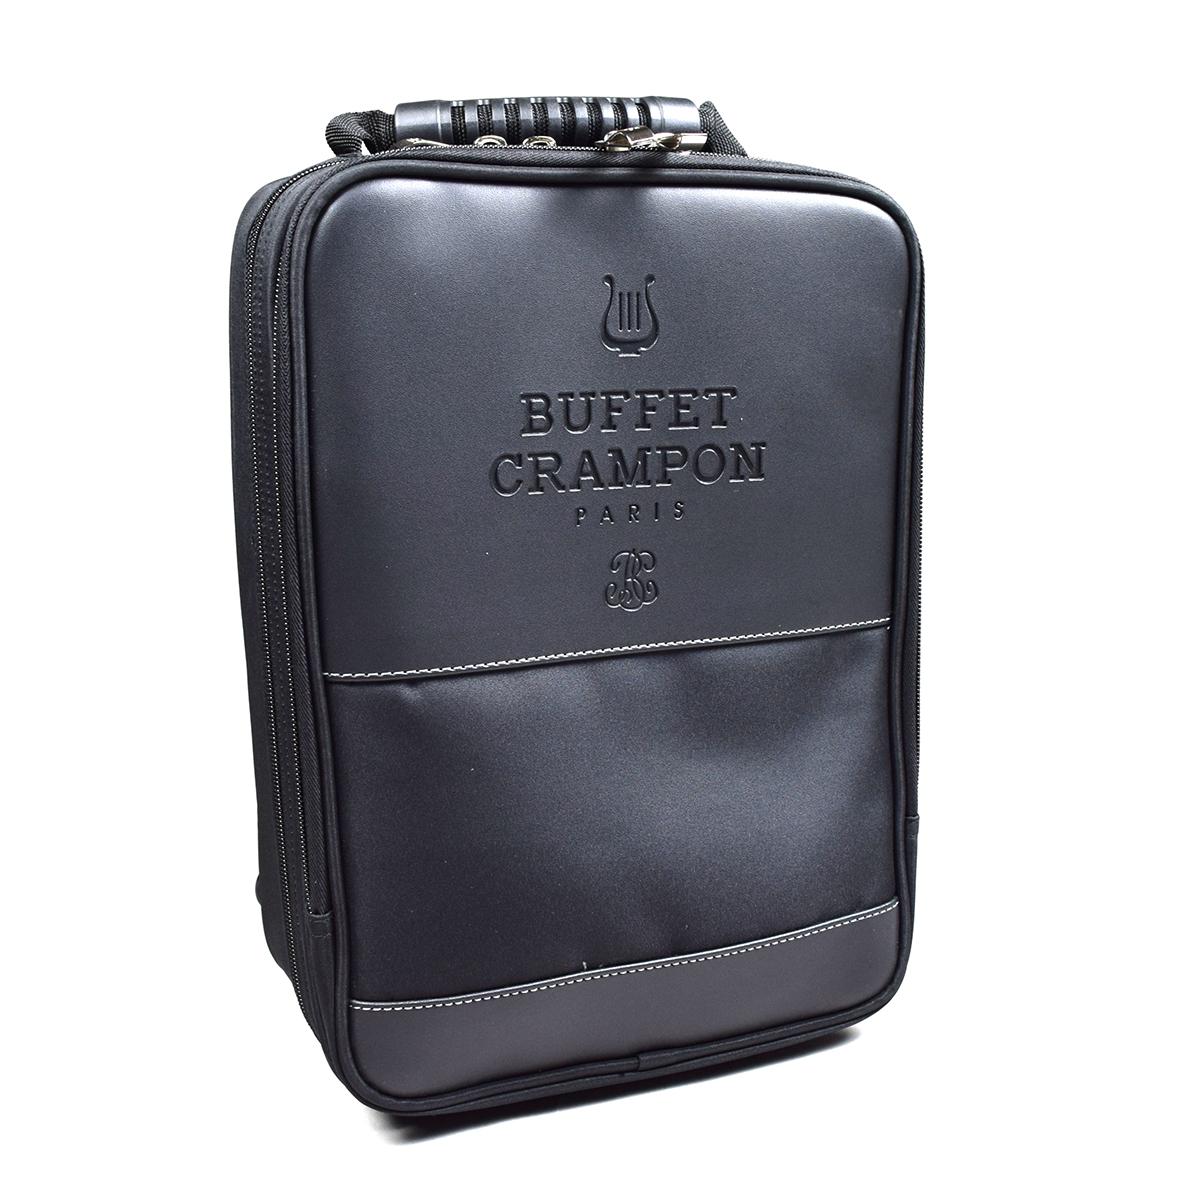 Buffet 人気 Crampon バックパック 新商品 ナイロン ギグバッグ クランポン ケース B♭クラリネット用 ビュッフェ